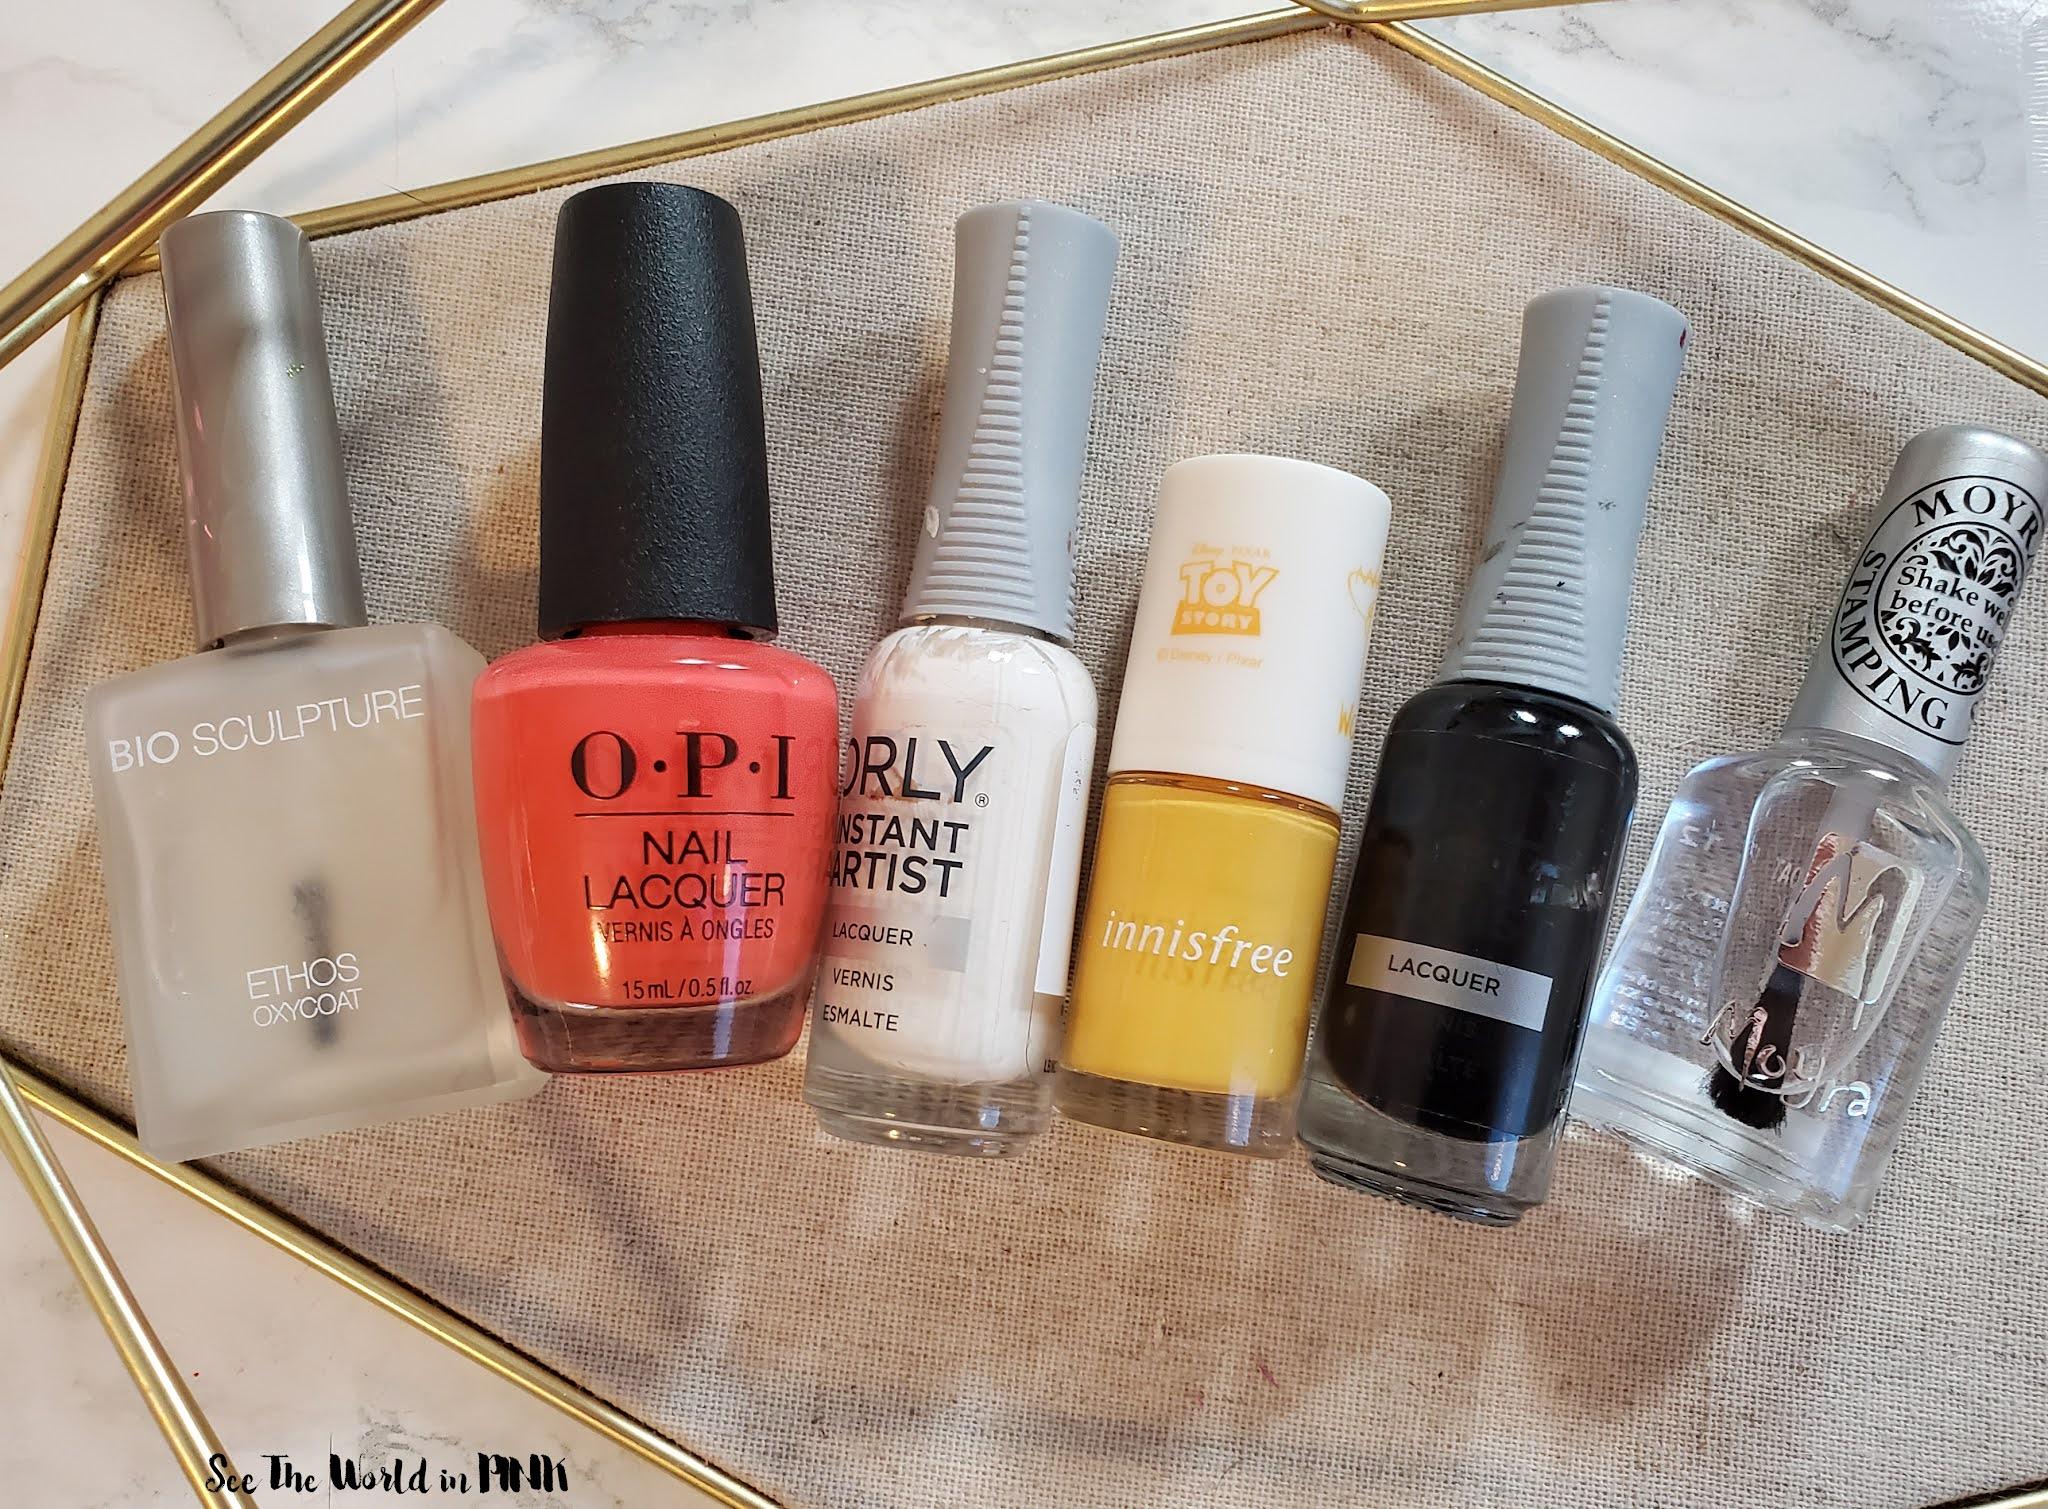 Manicure Monday - Bright, Happy Face Nails